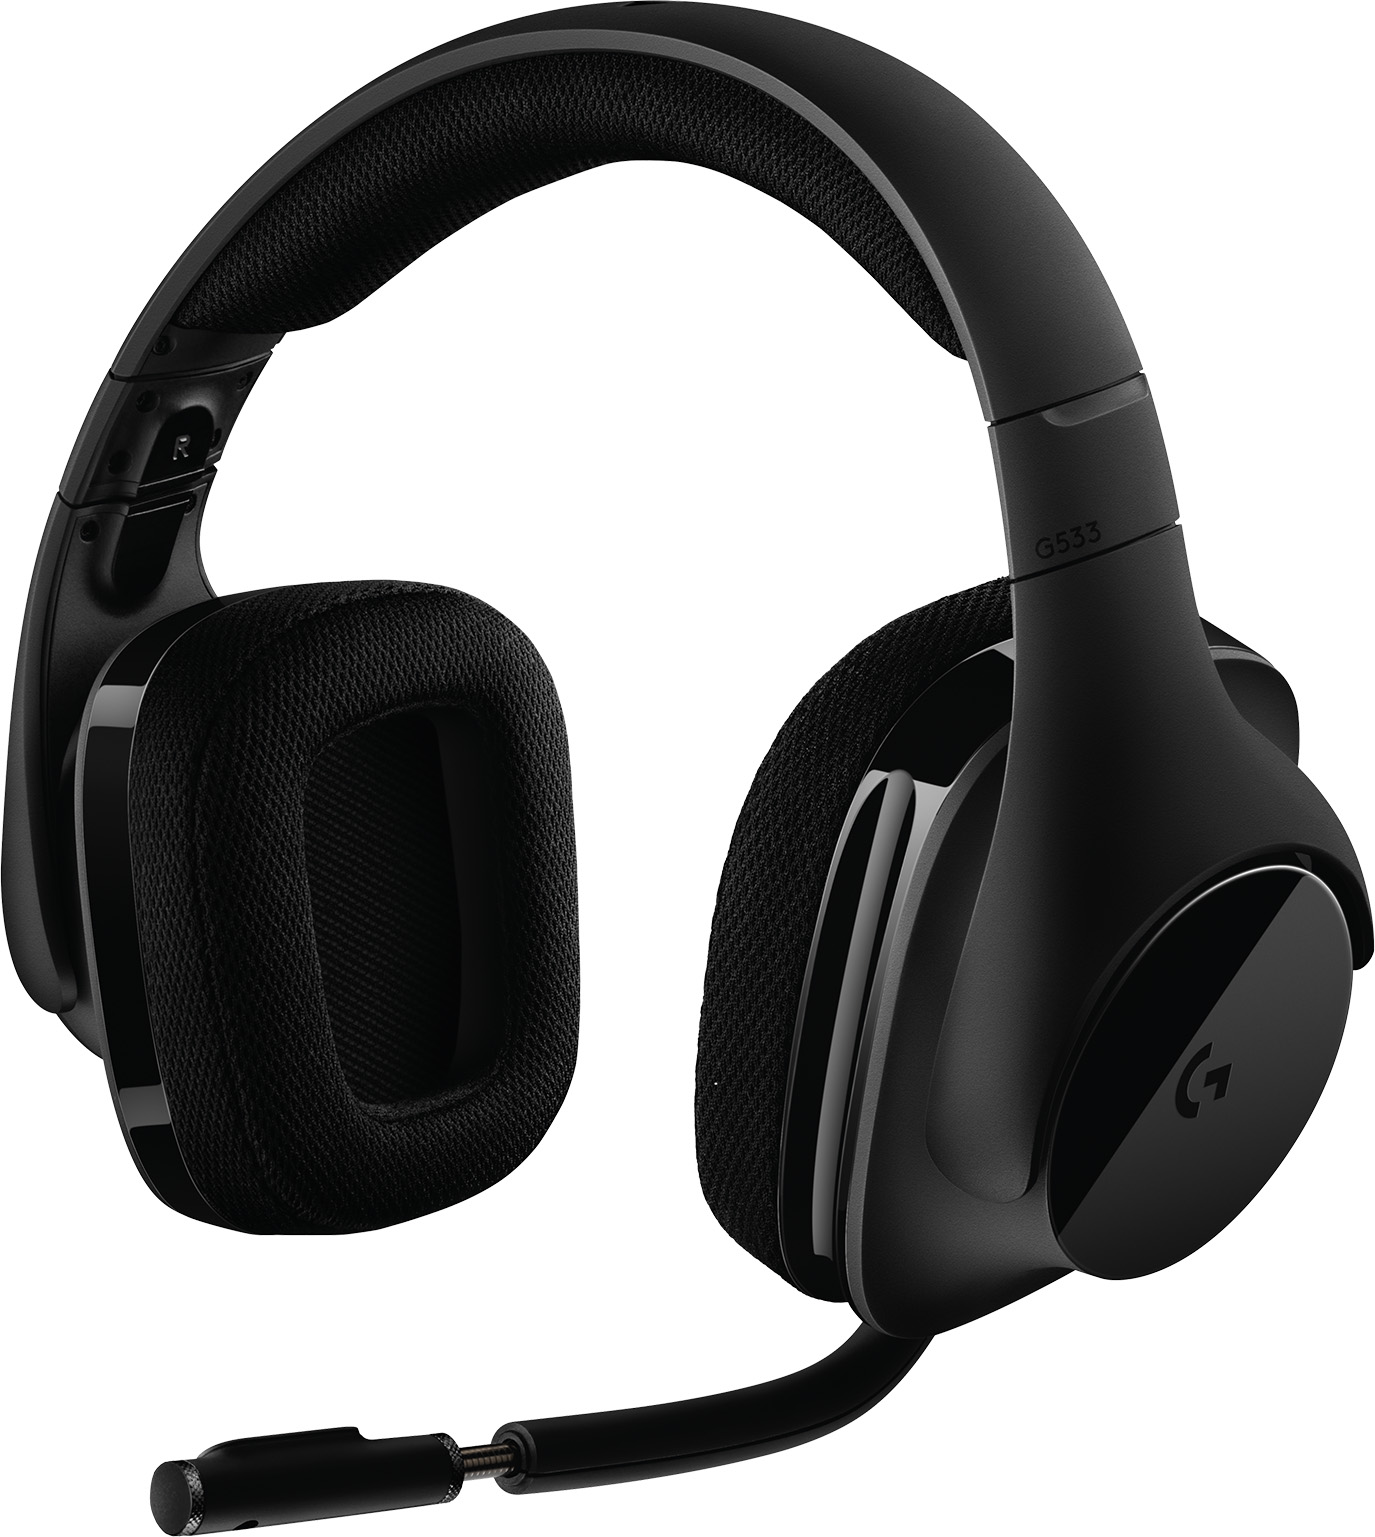 Logitech G533 Wireless DTS 7.1 Surround Gaming Headset Deal